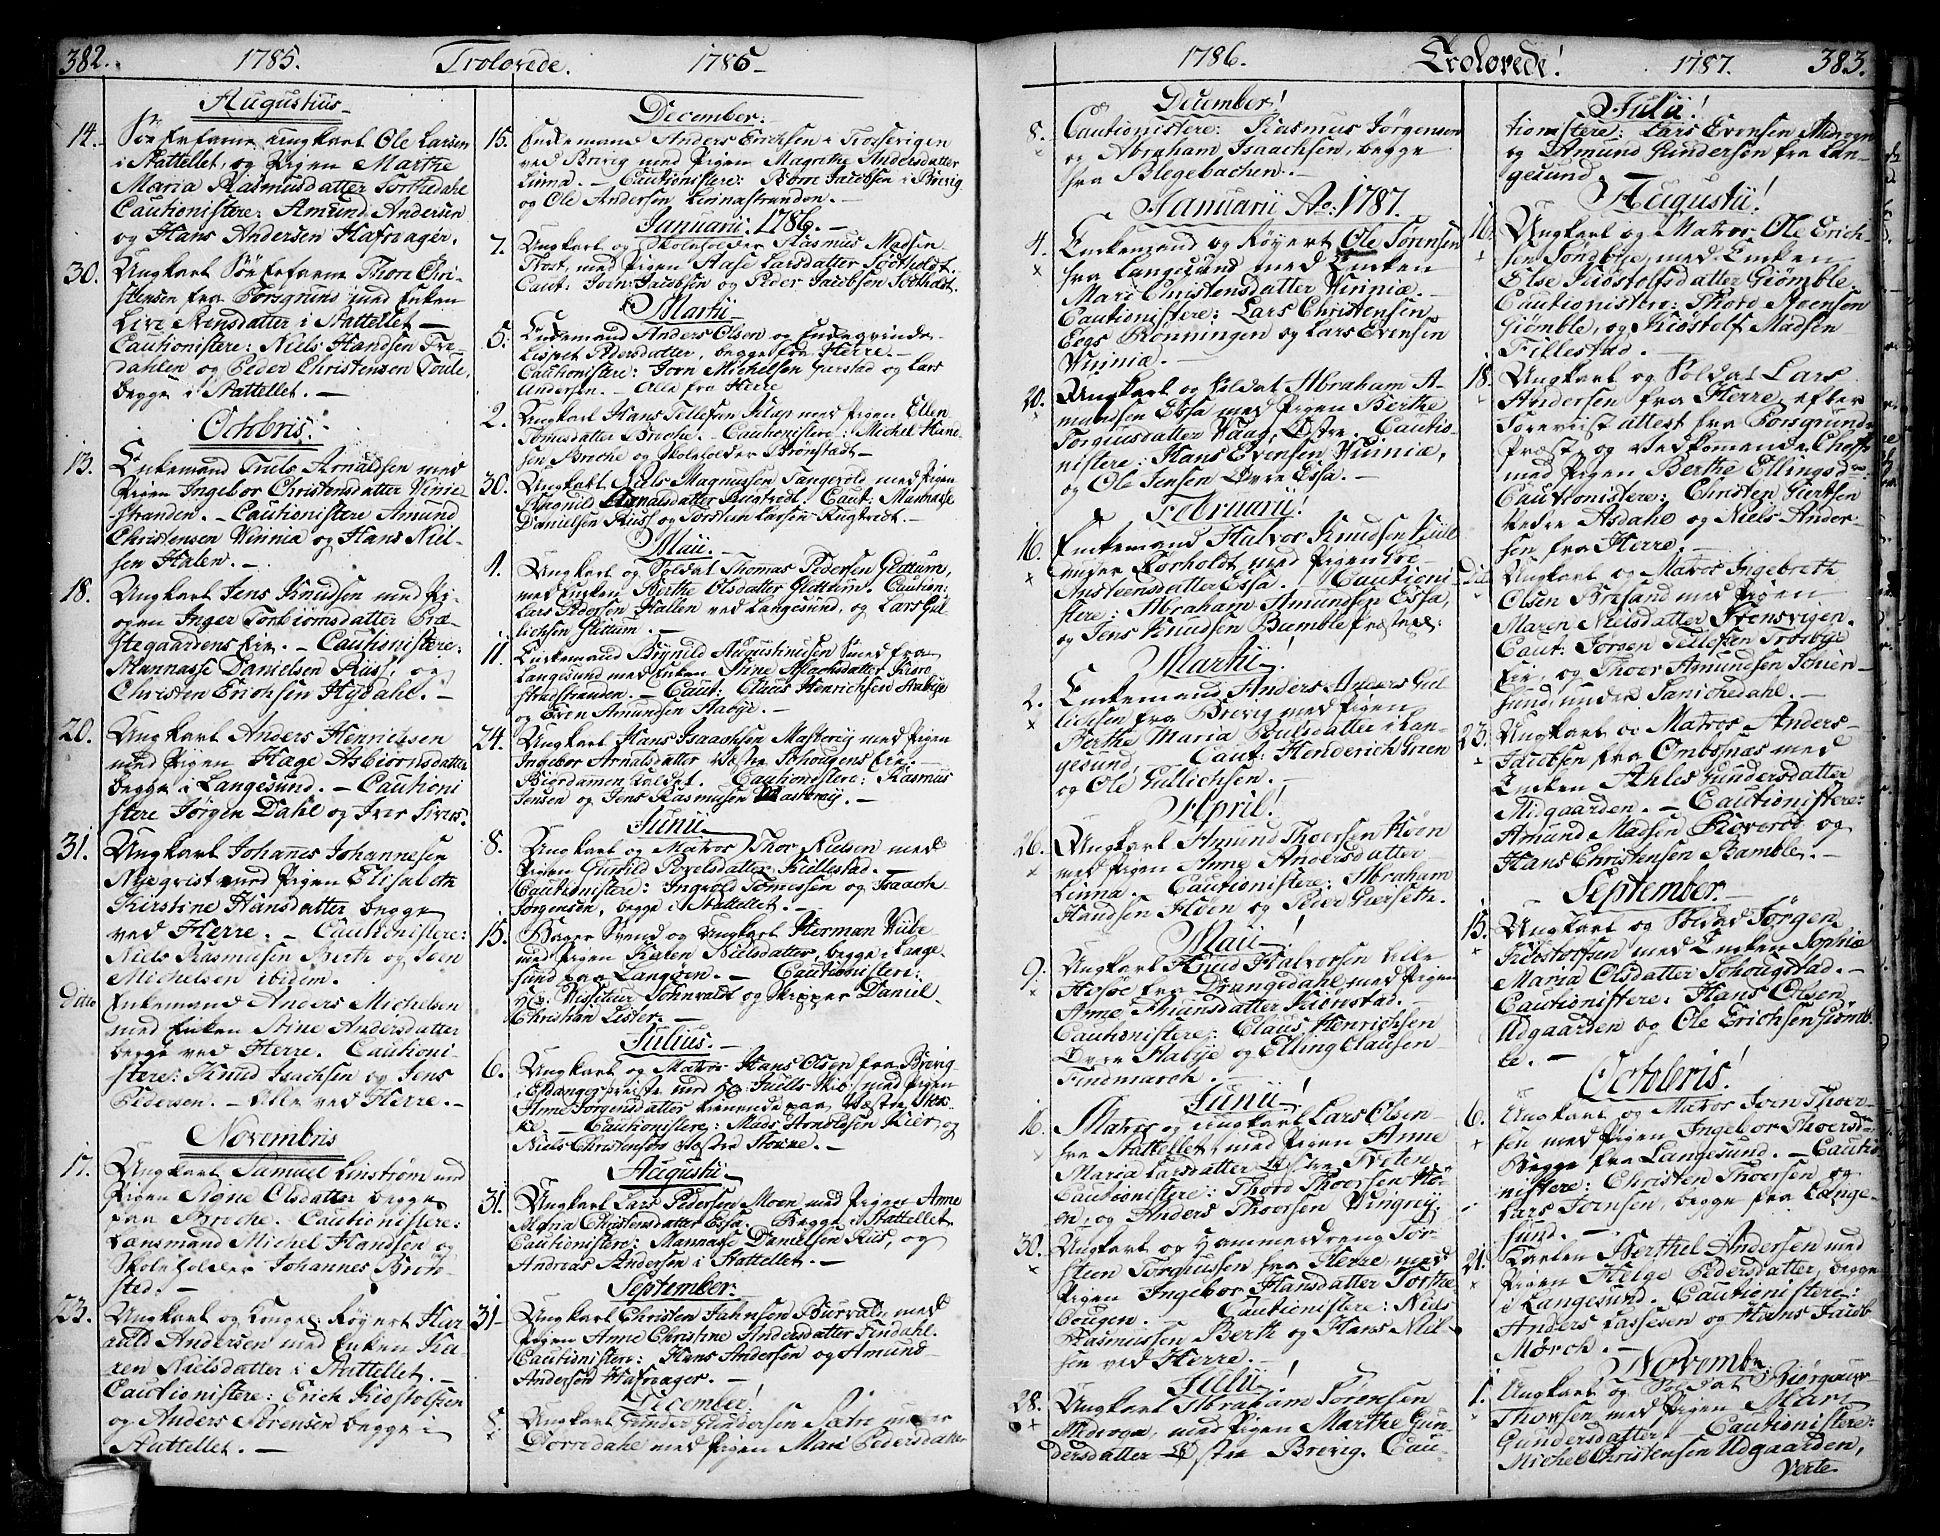 SAKO, Bamble kirkebøker, F/Fa/L0002: Ministerialbok nr. I 2, 1775-1814, s. 382-383